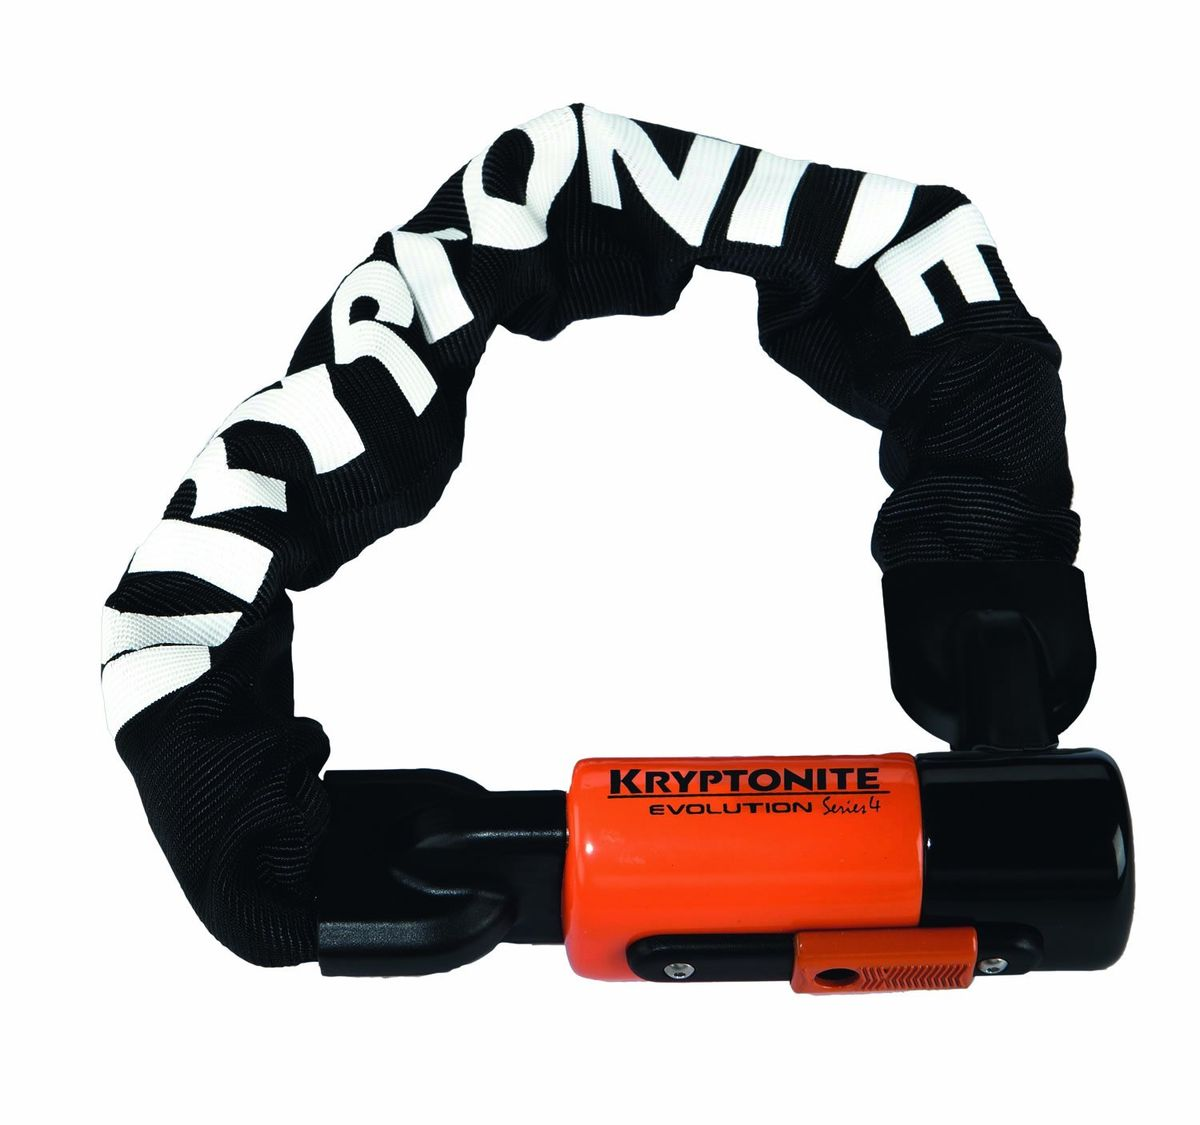 "Замок велосипедный Kryptonite ""Chains Evolution Series 4 1090 Integrated Chain"", цвет: черный, 10 мм x 90 см"